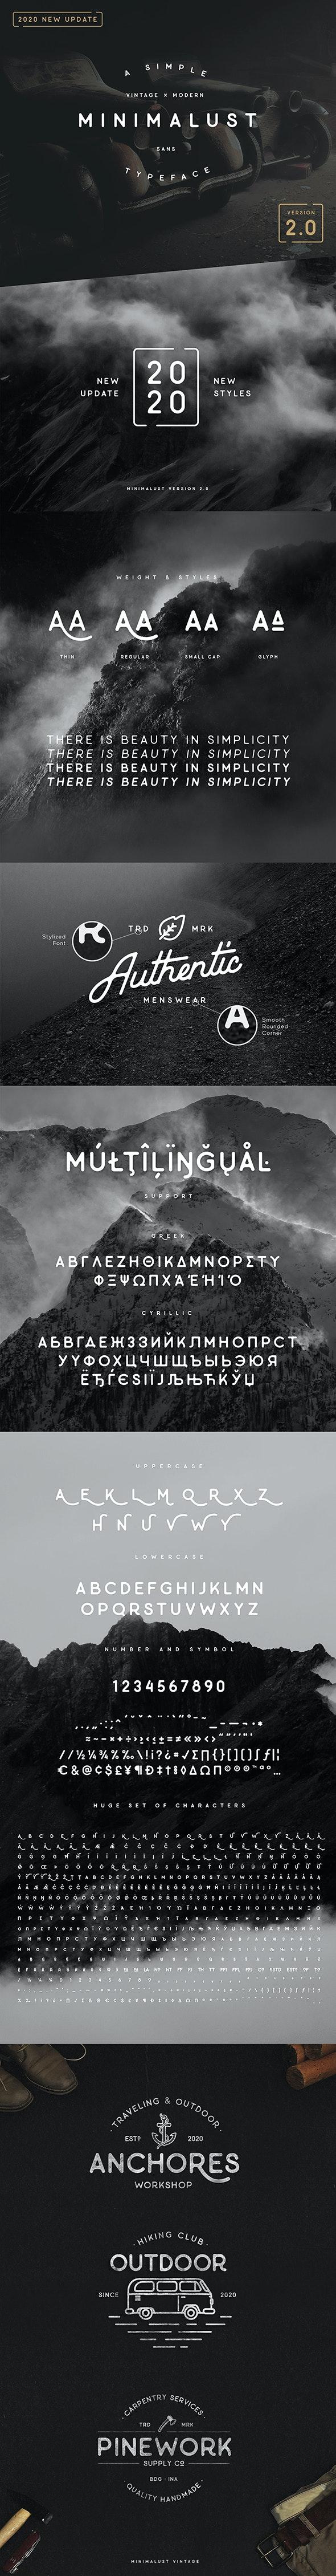 Minimalust Typeface - Sans-Serif Fonts